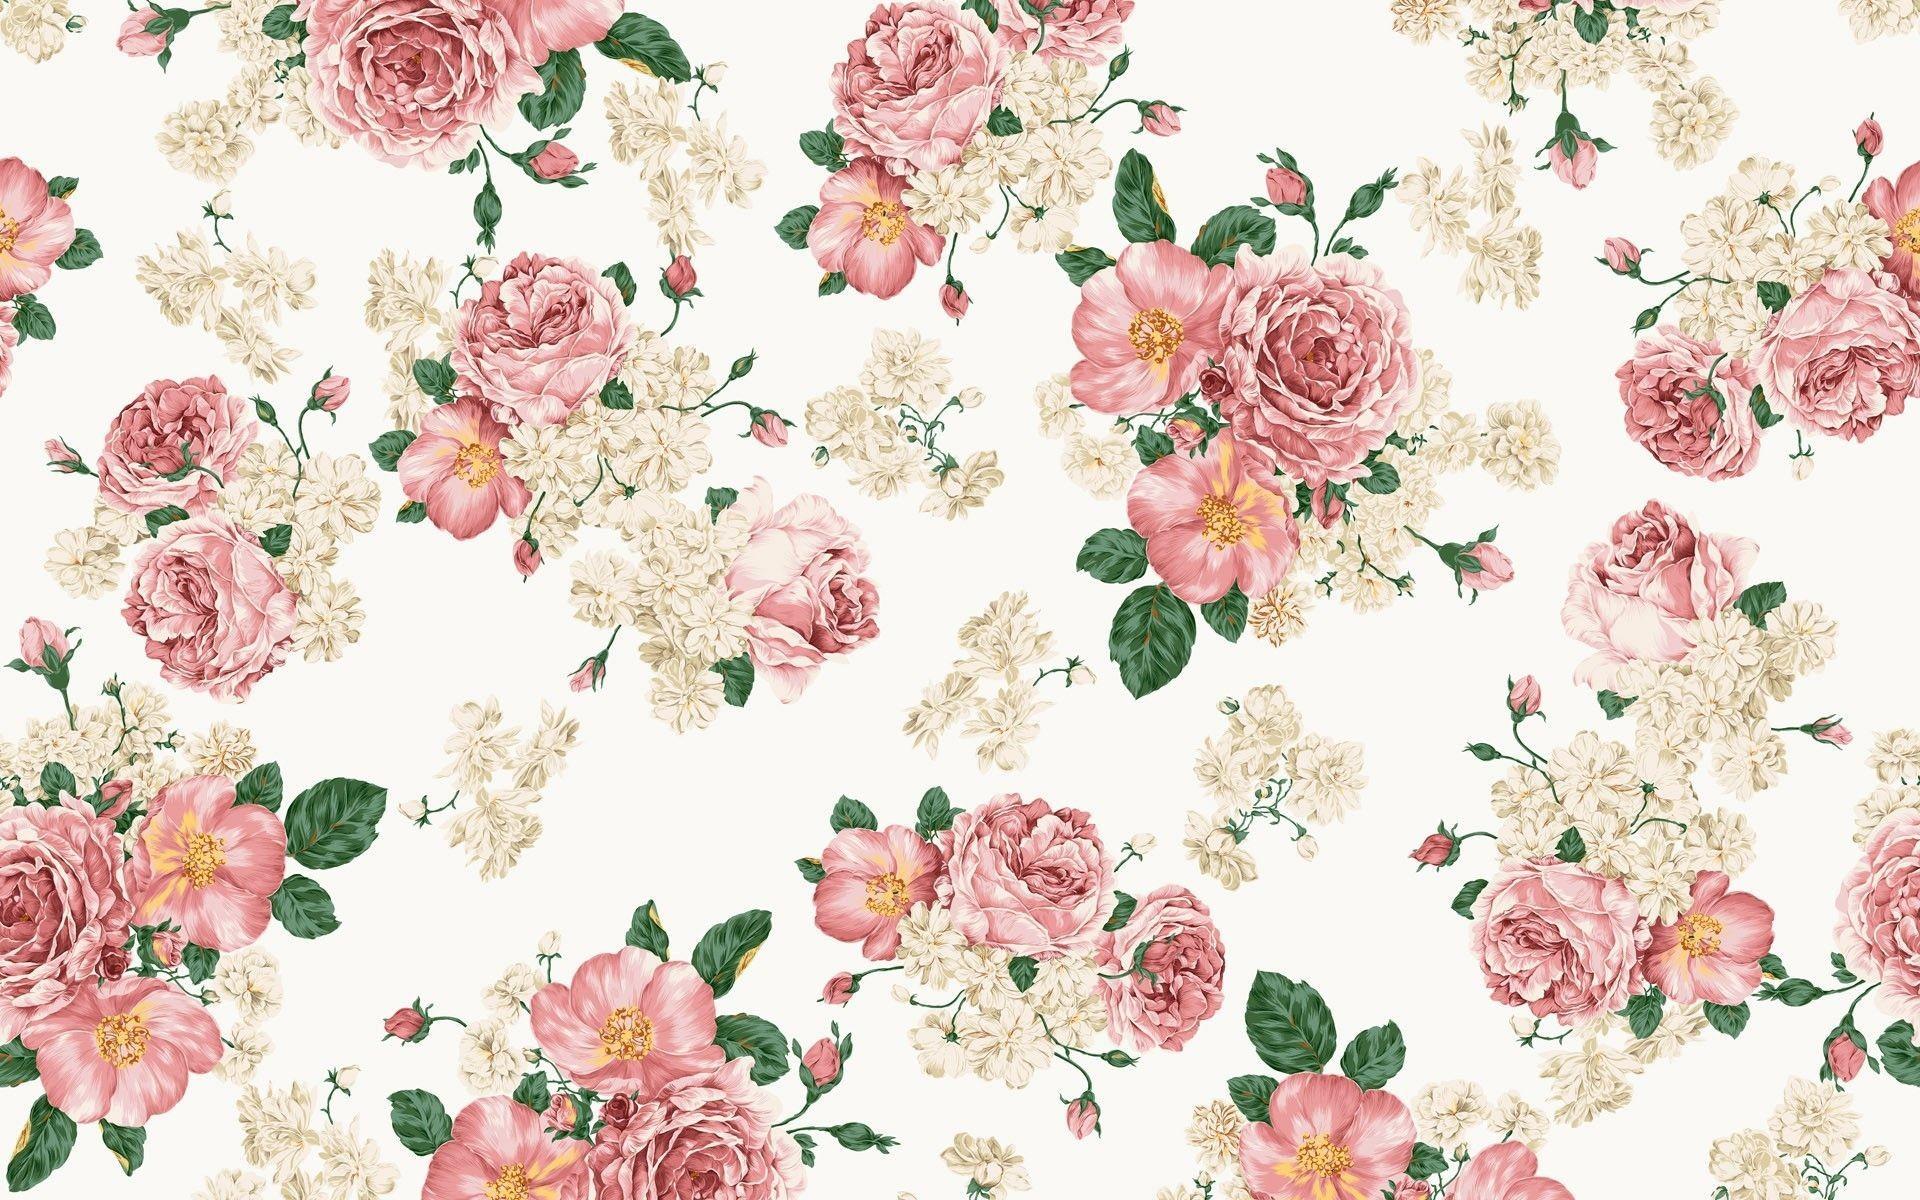 Floral Desktop Wallpaper Download Free Cool Full Hd Wallpapers